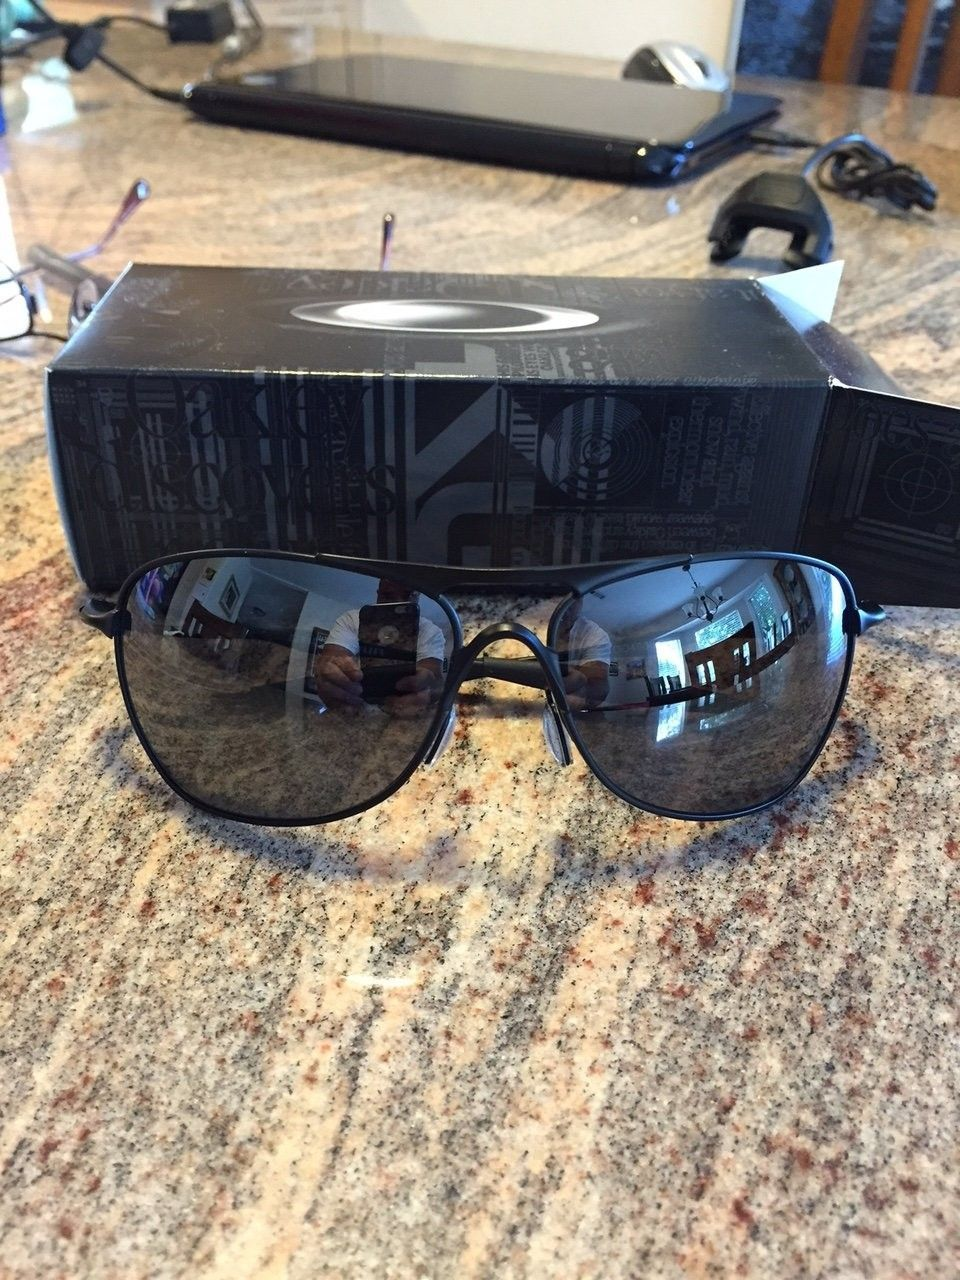 Crosshair - Matte Black/Black Iridium Sunglasses - IMG_5866.JPG